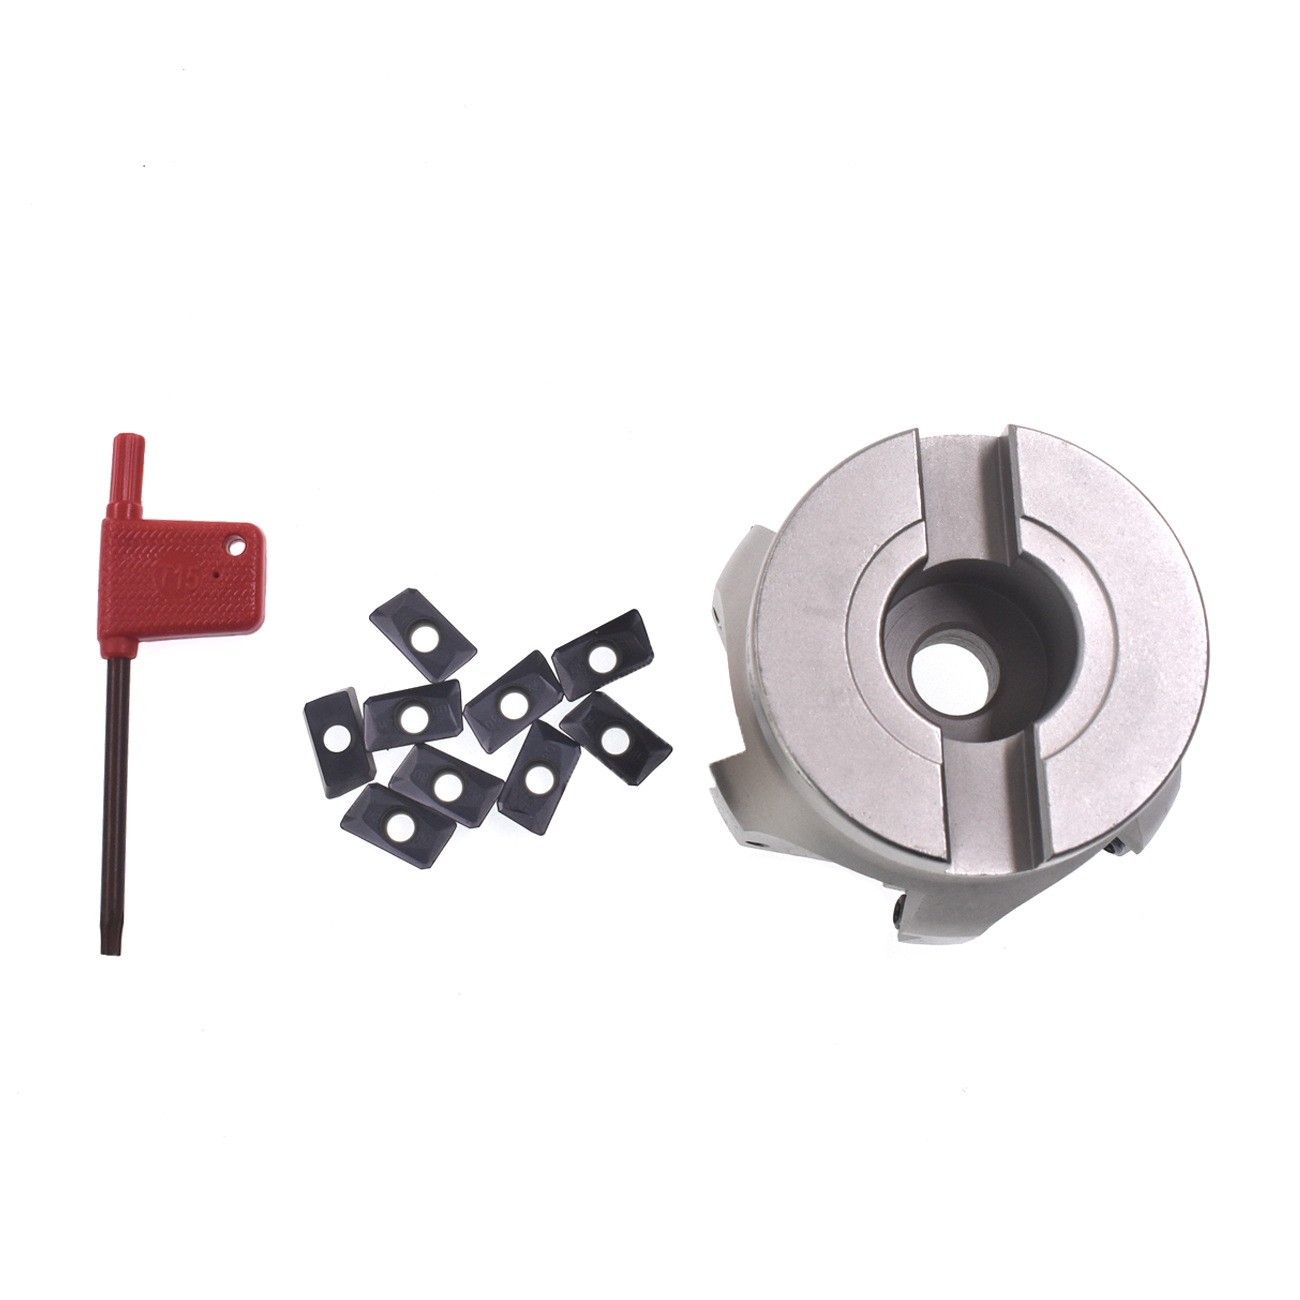 10 APMT1604PDER Insert + 400R-80-27-6F 6Flute BAP Indexable Face End Mill Cutter